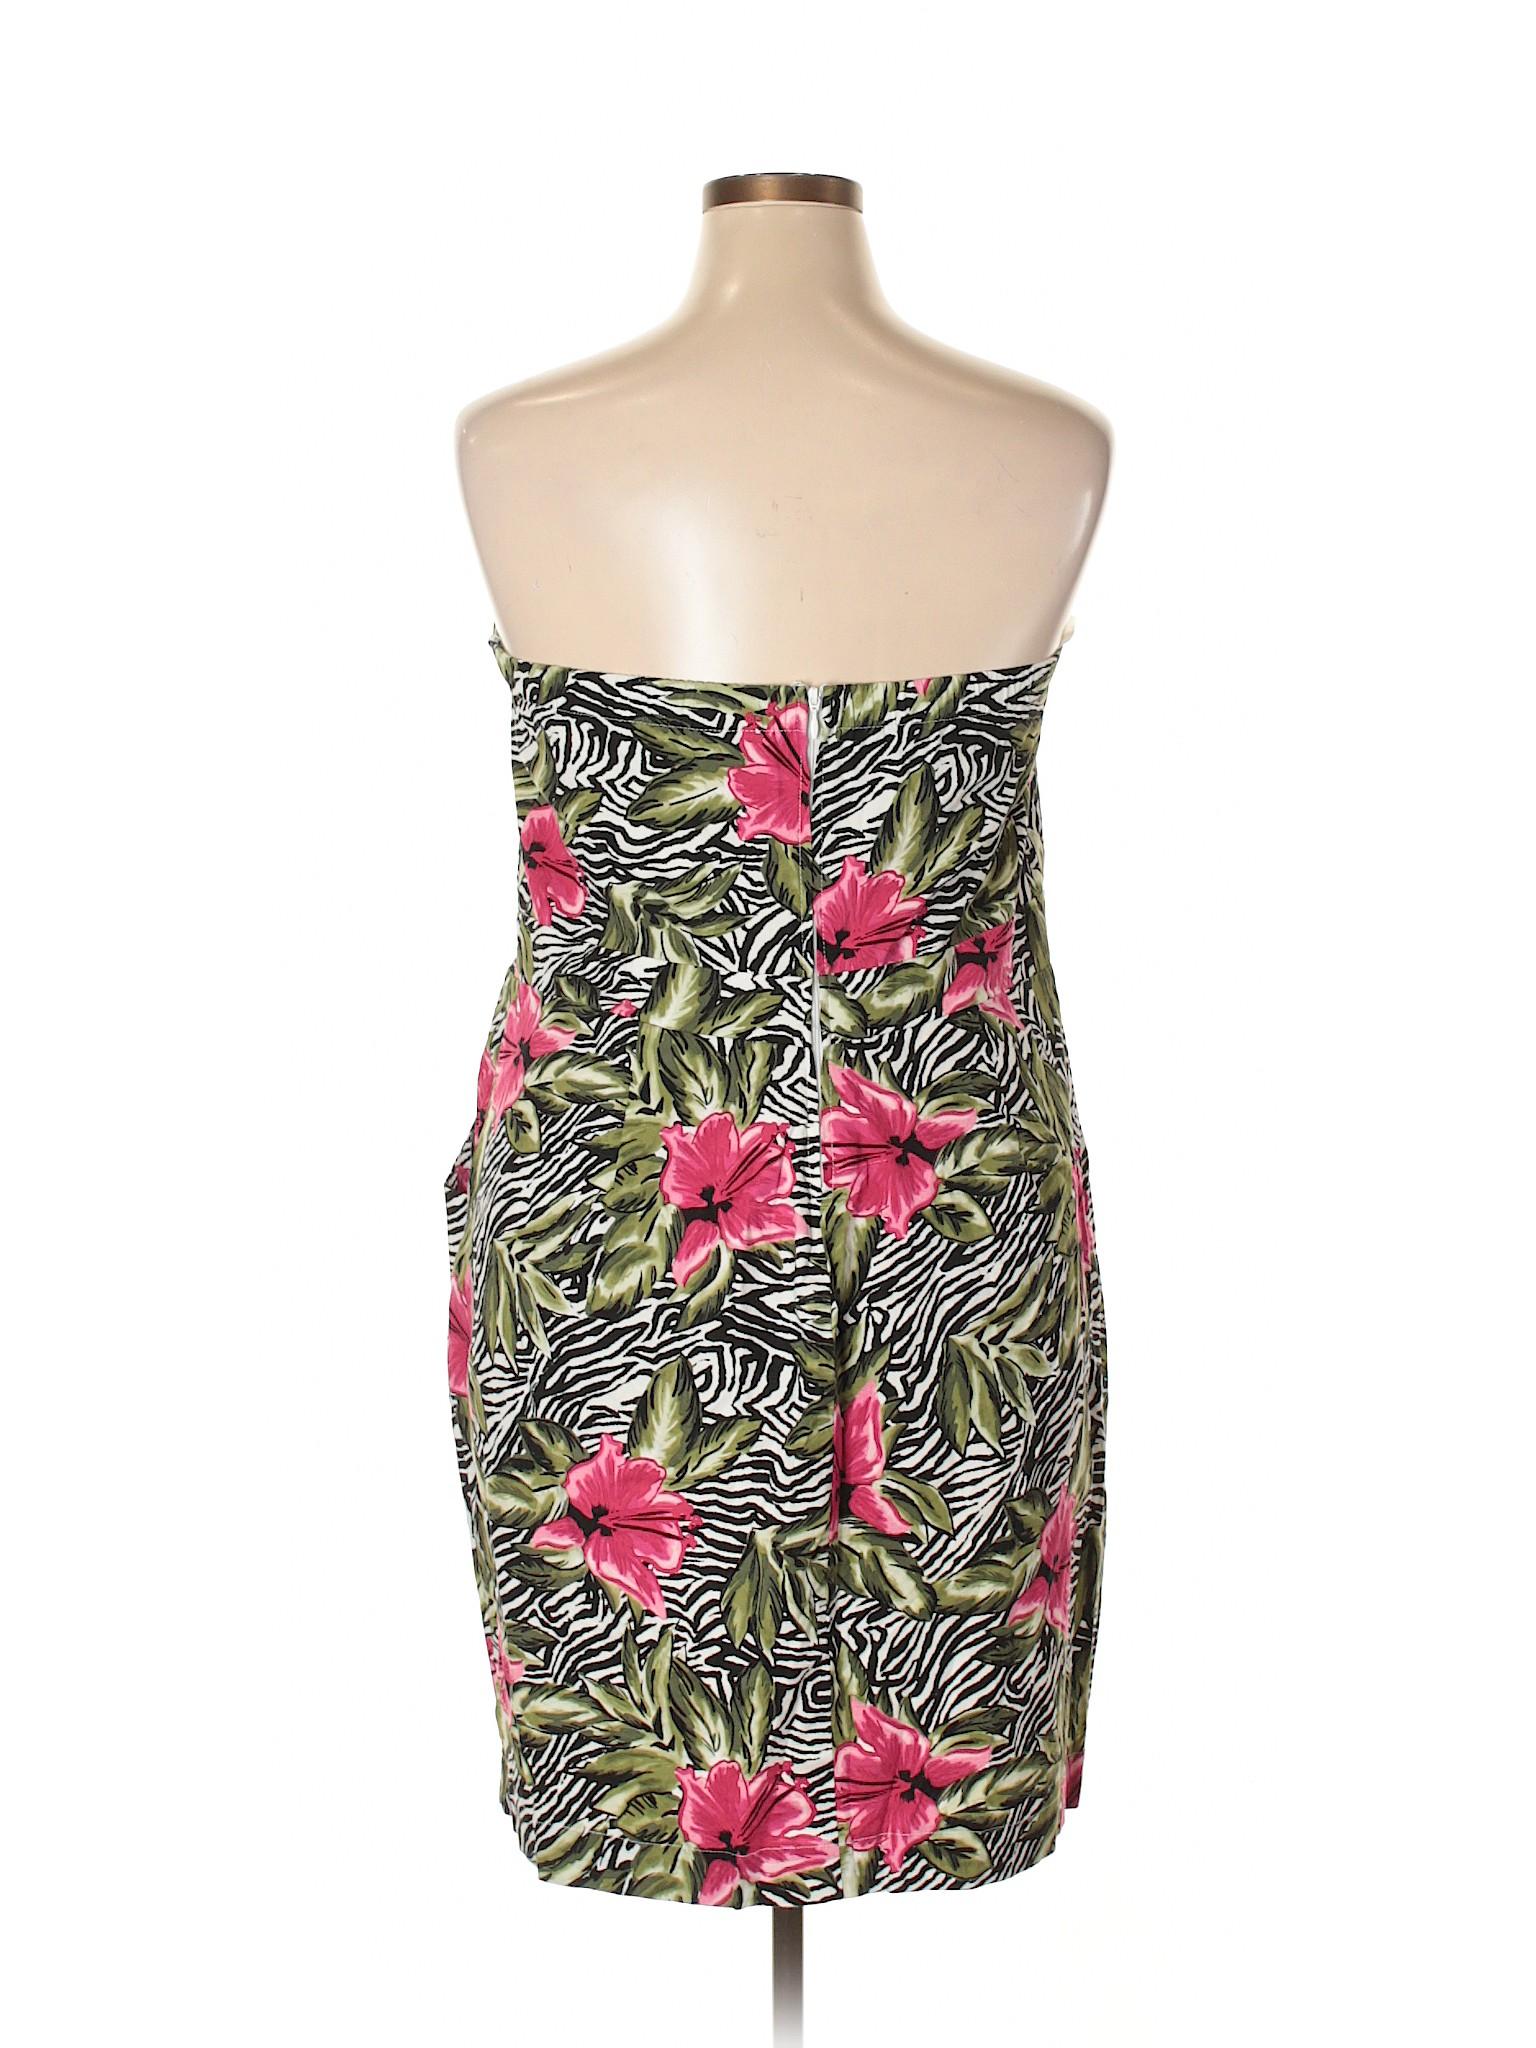 Boutique Casual Torrid Boutique winter winter Dress FqTaq